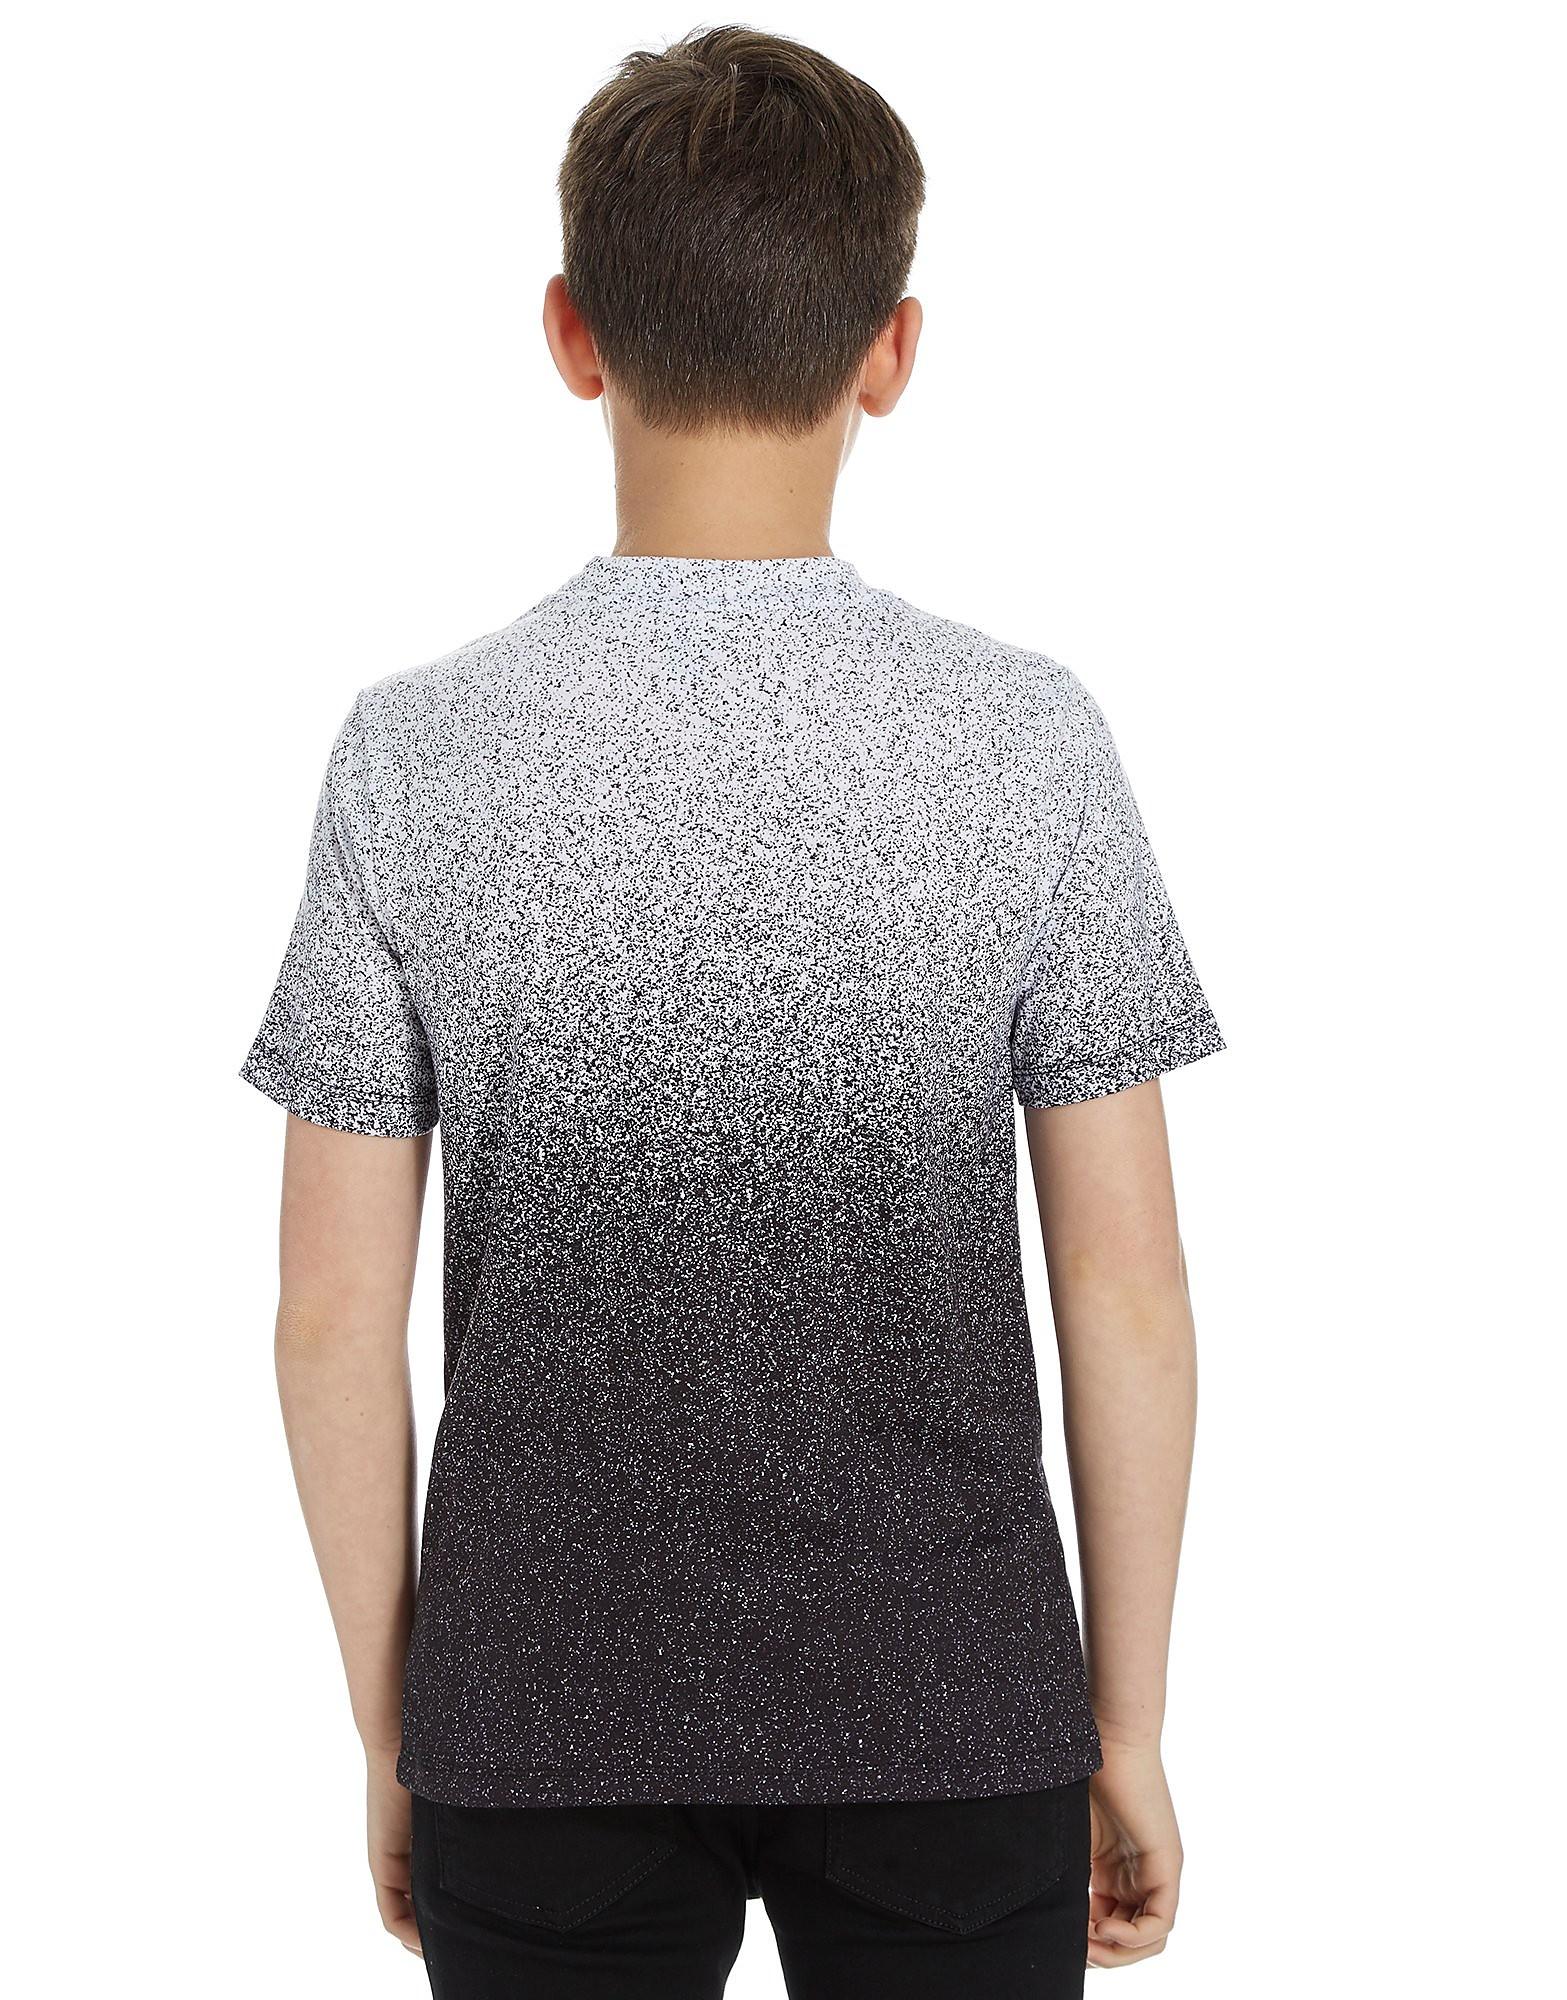 Hype Speckle Fade T-Shirt Junior